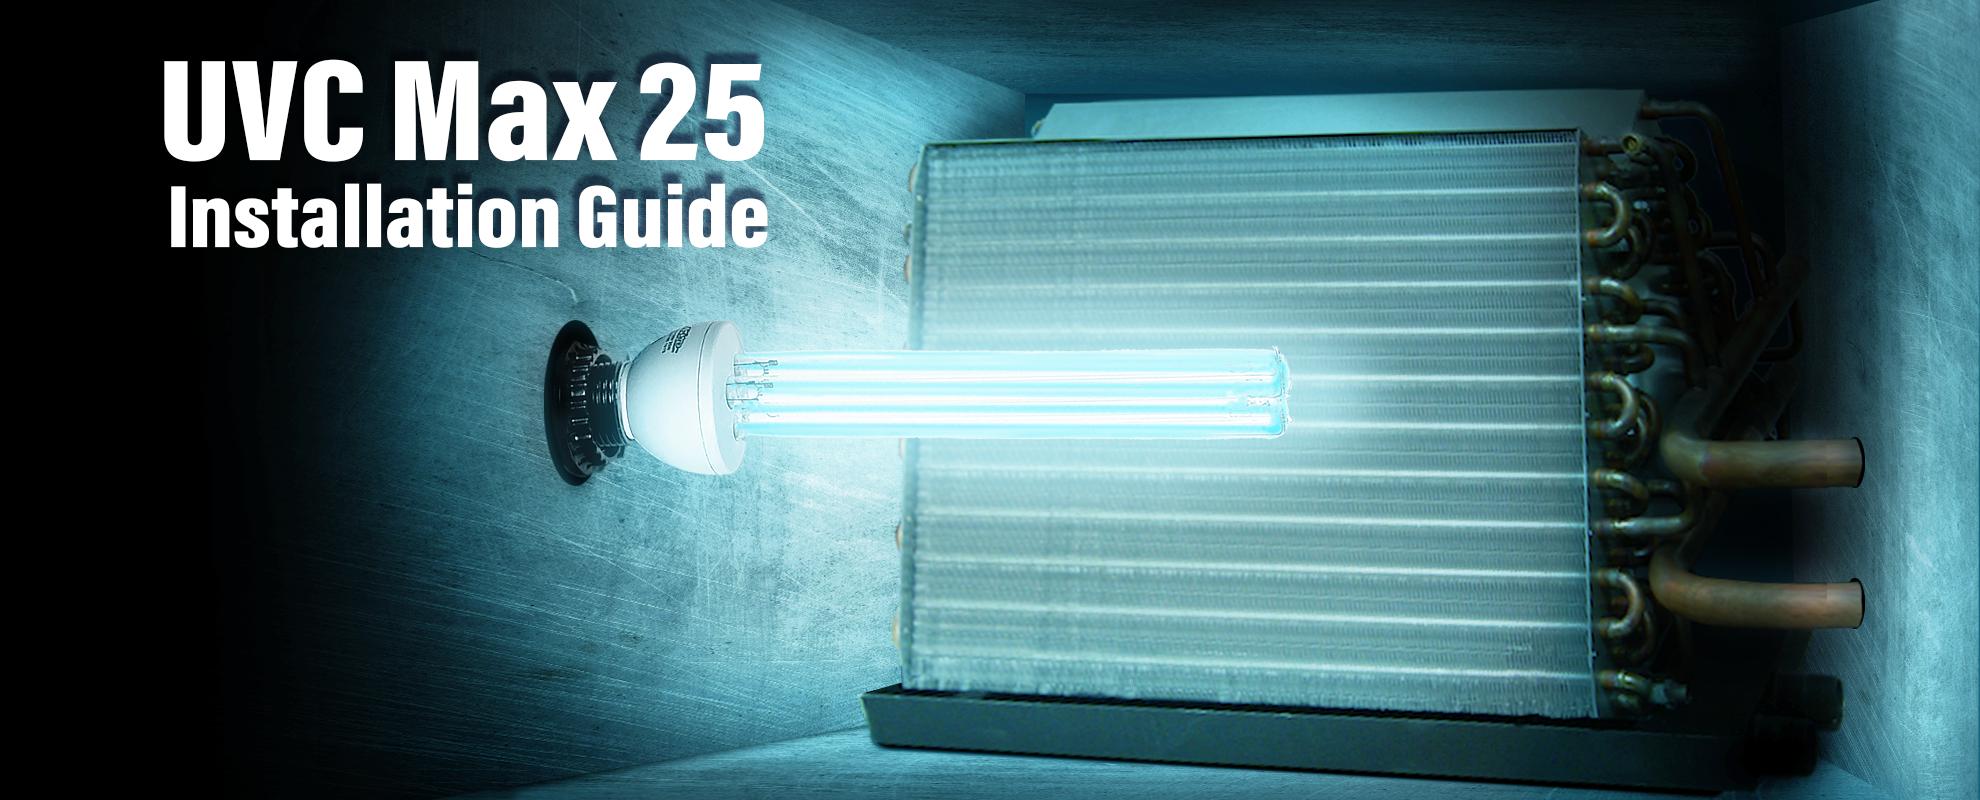 UVC Max 25 Installation Guide Image